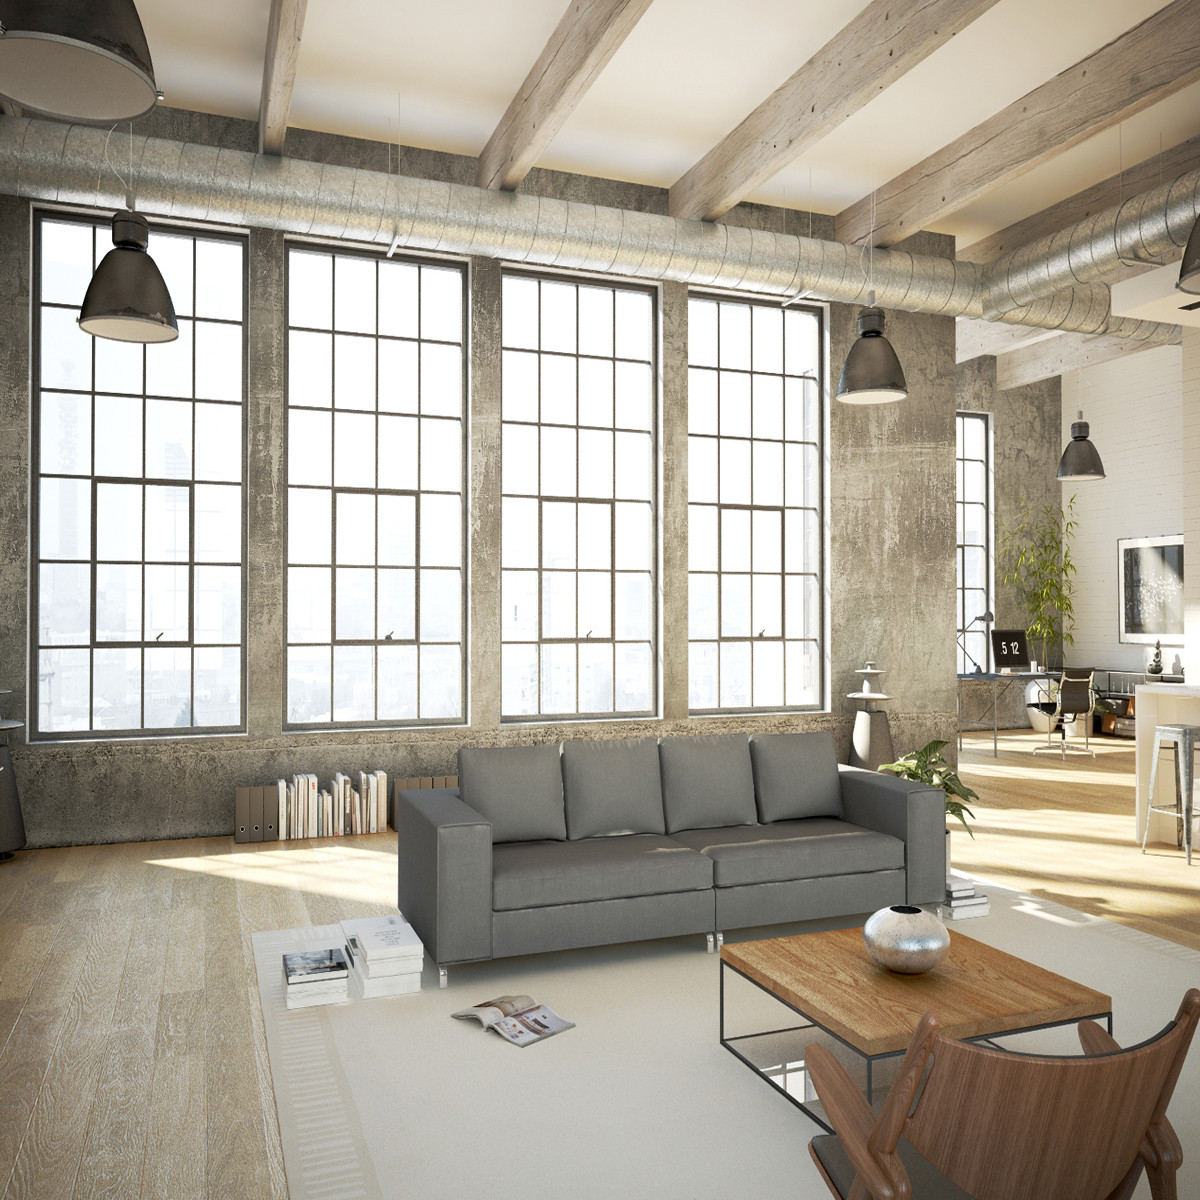 New York Lofts: New York Style Loft 3d 3ds